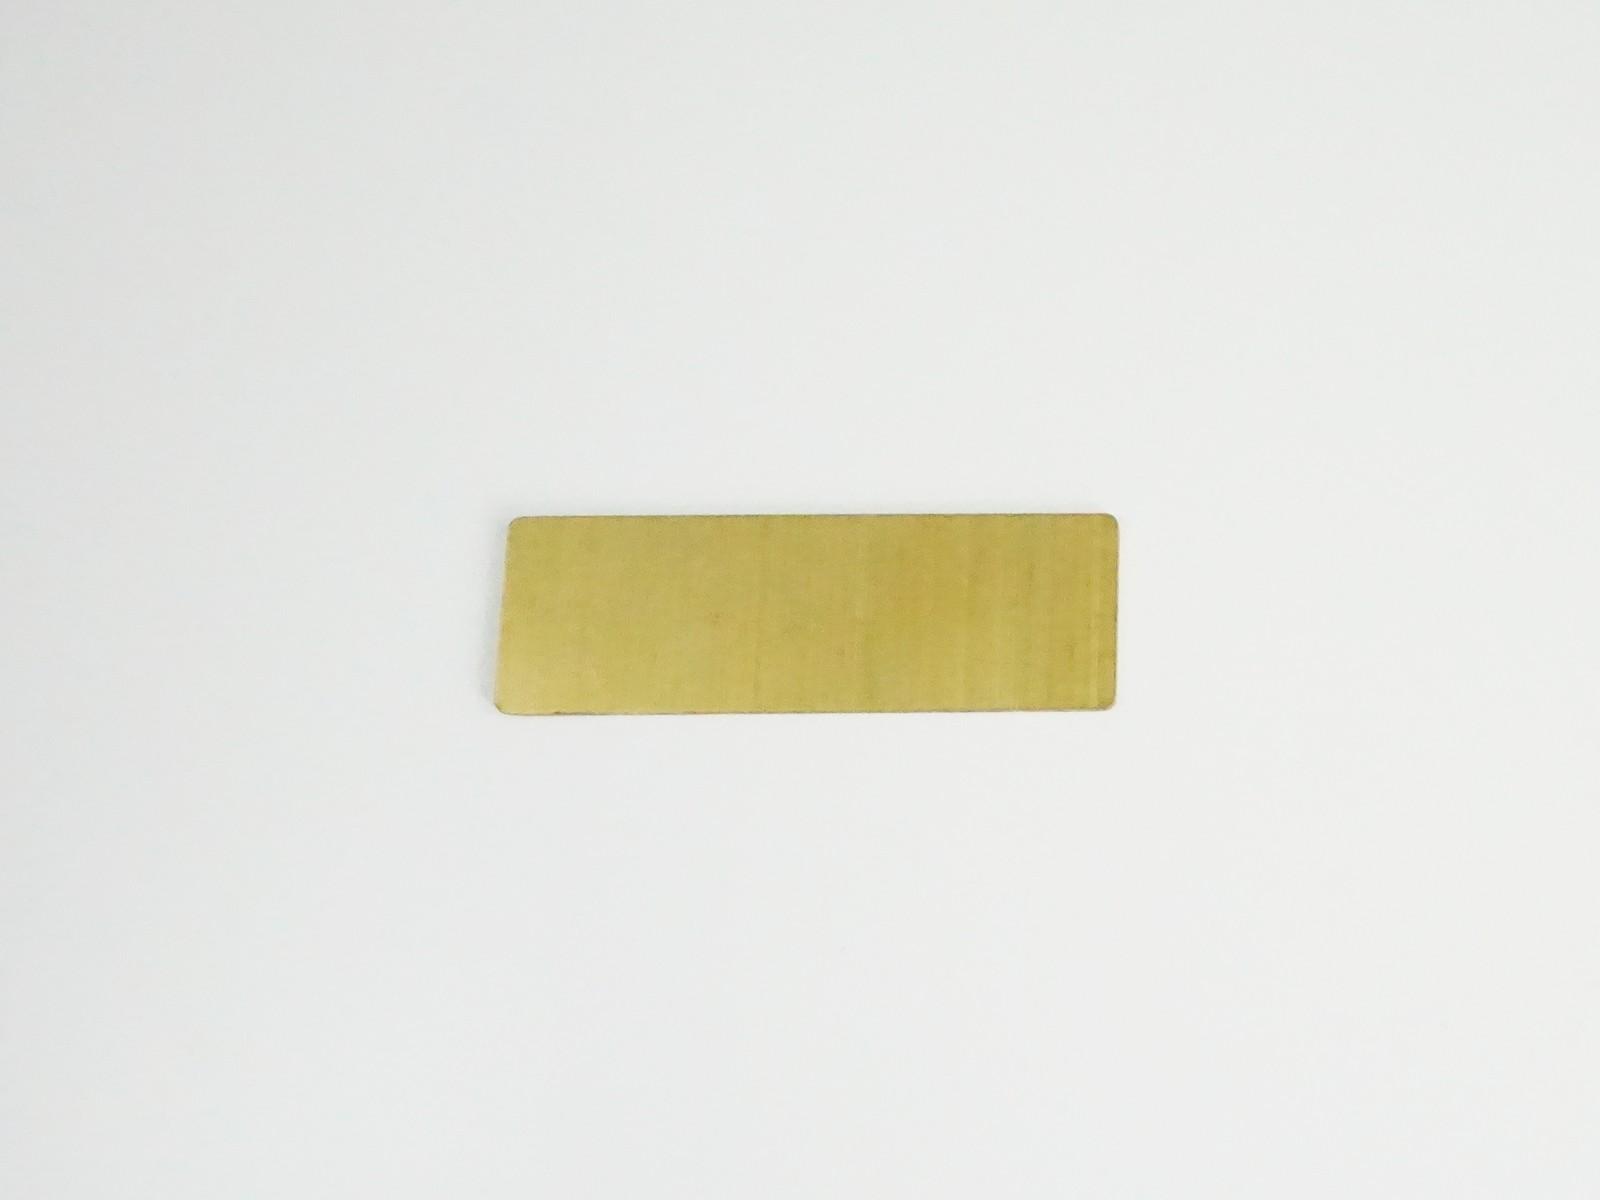 "1"" x 3"" Satin Gold Badge Blank Back"